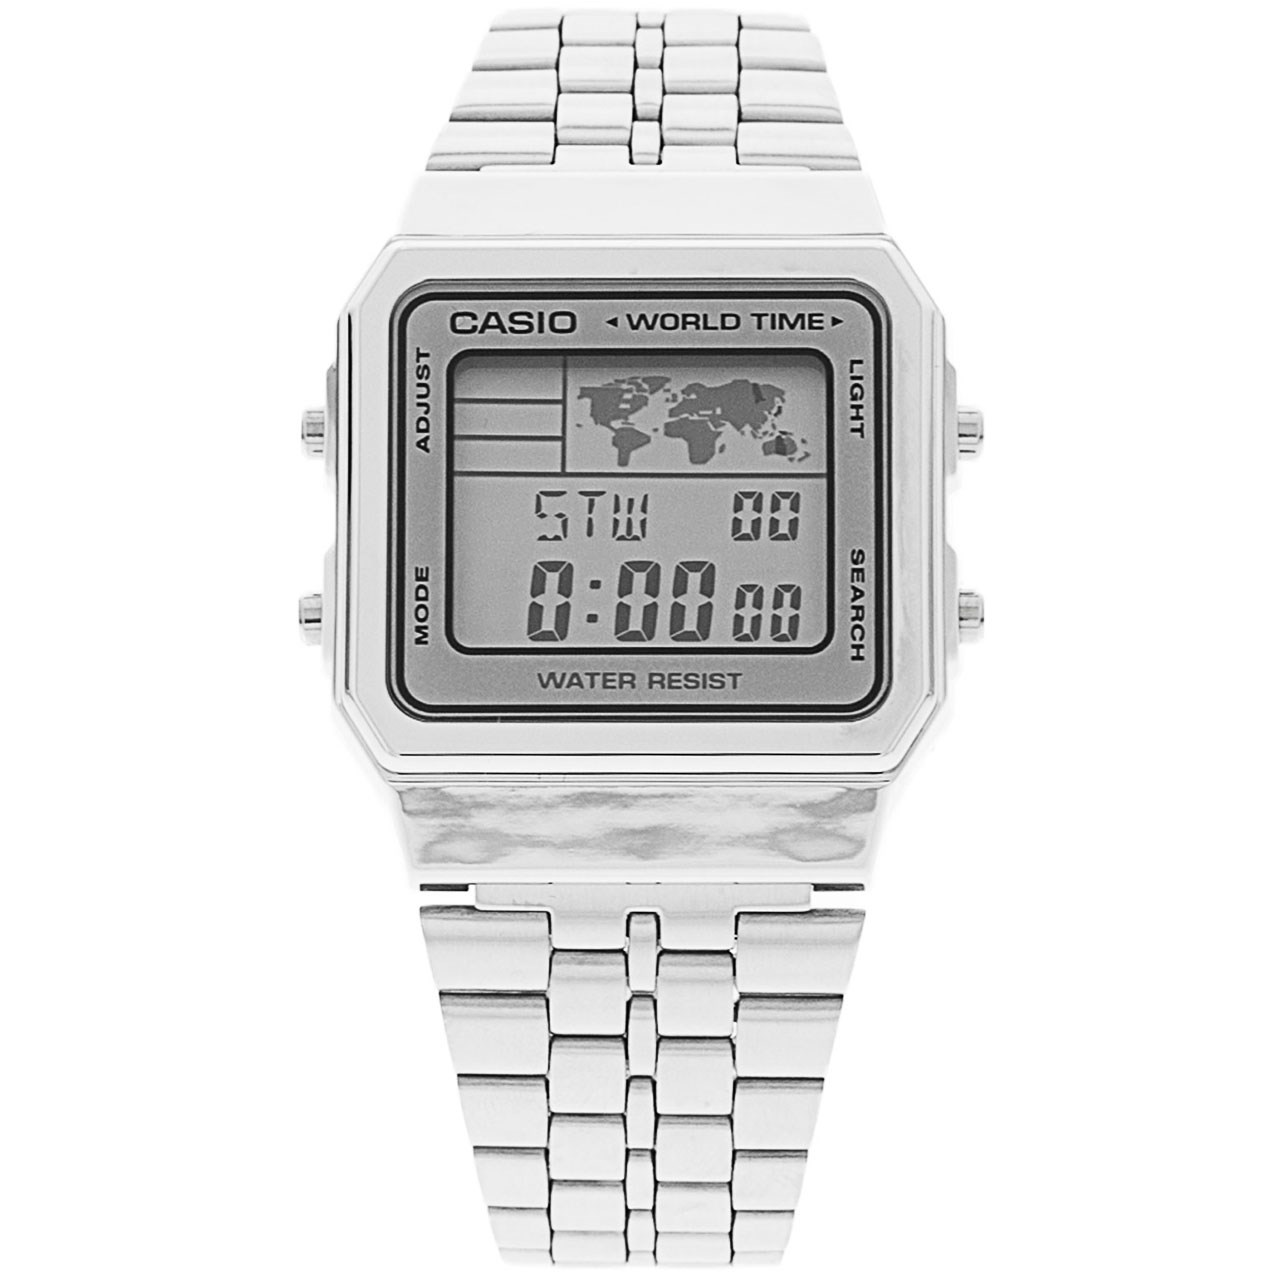 ساعت مچی دیجیتال مردانه کاسیو مدل A500WA-7DF